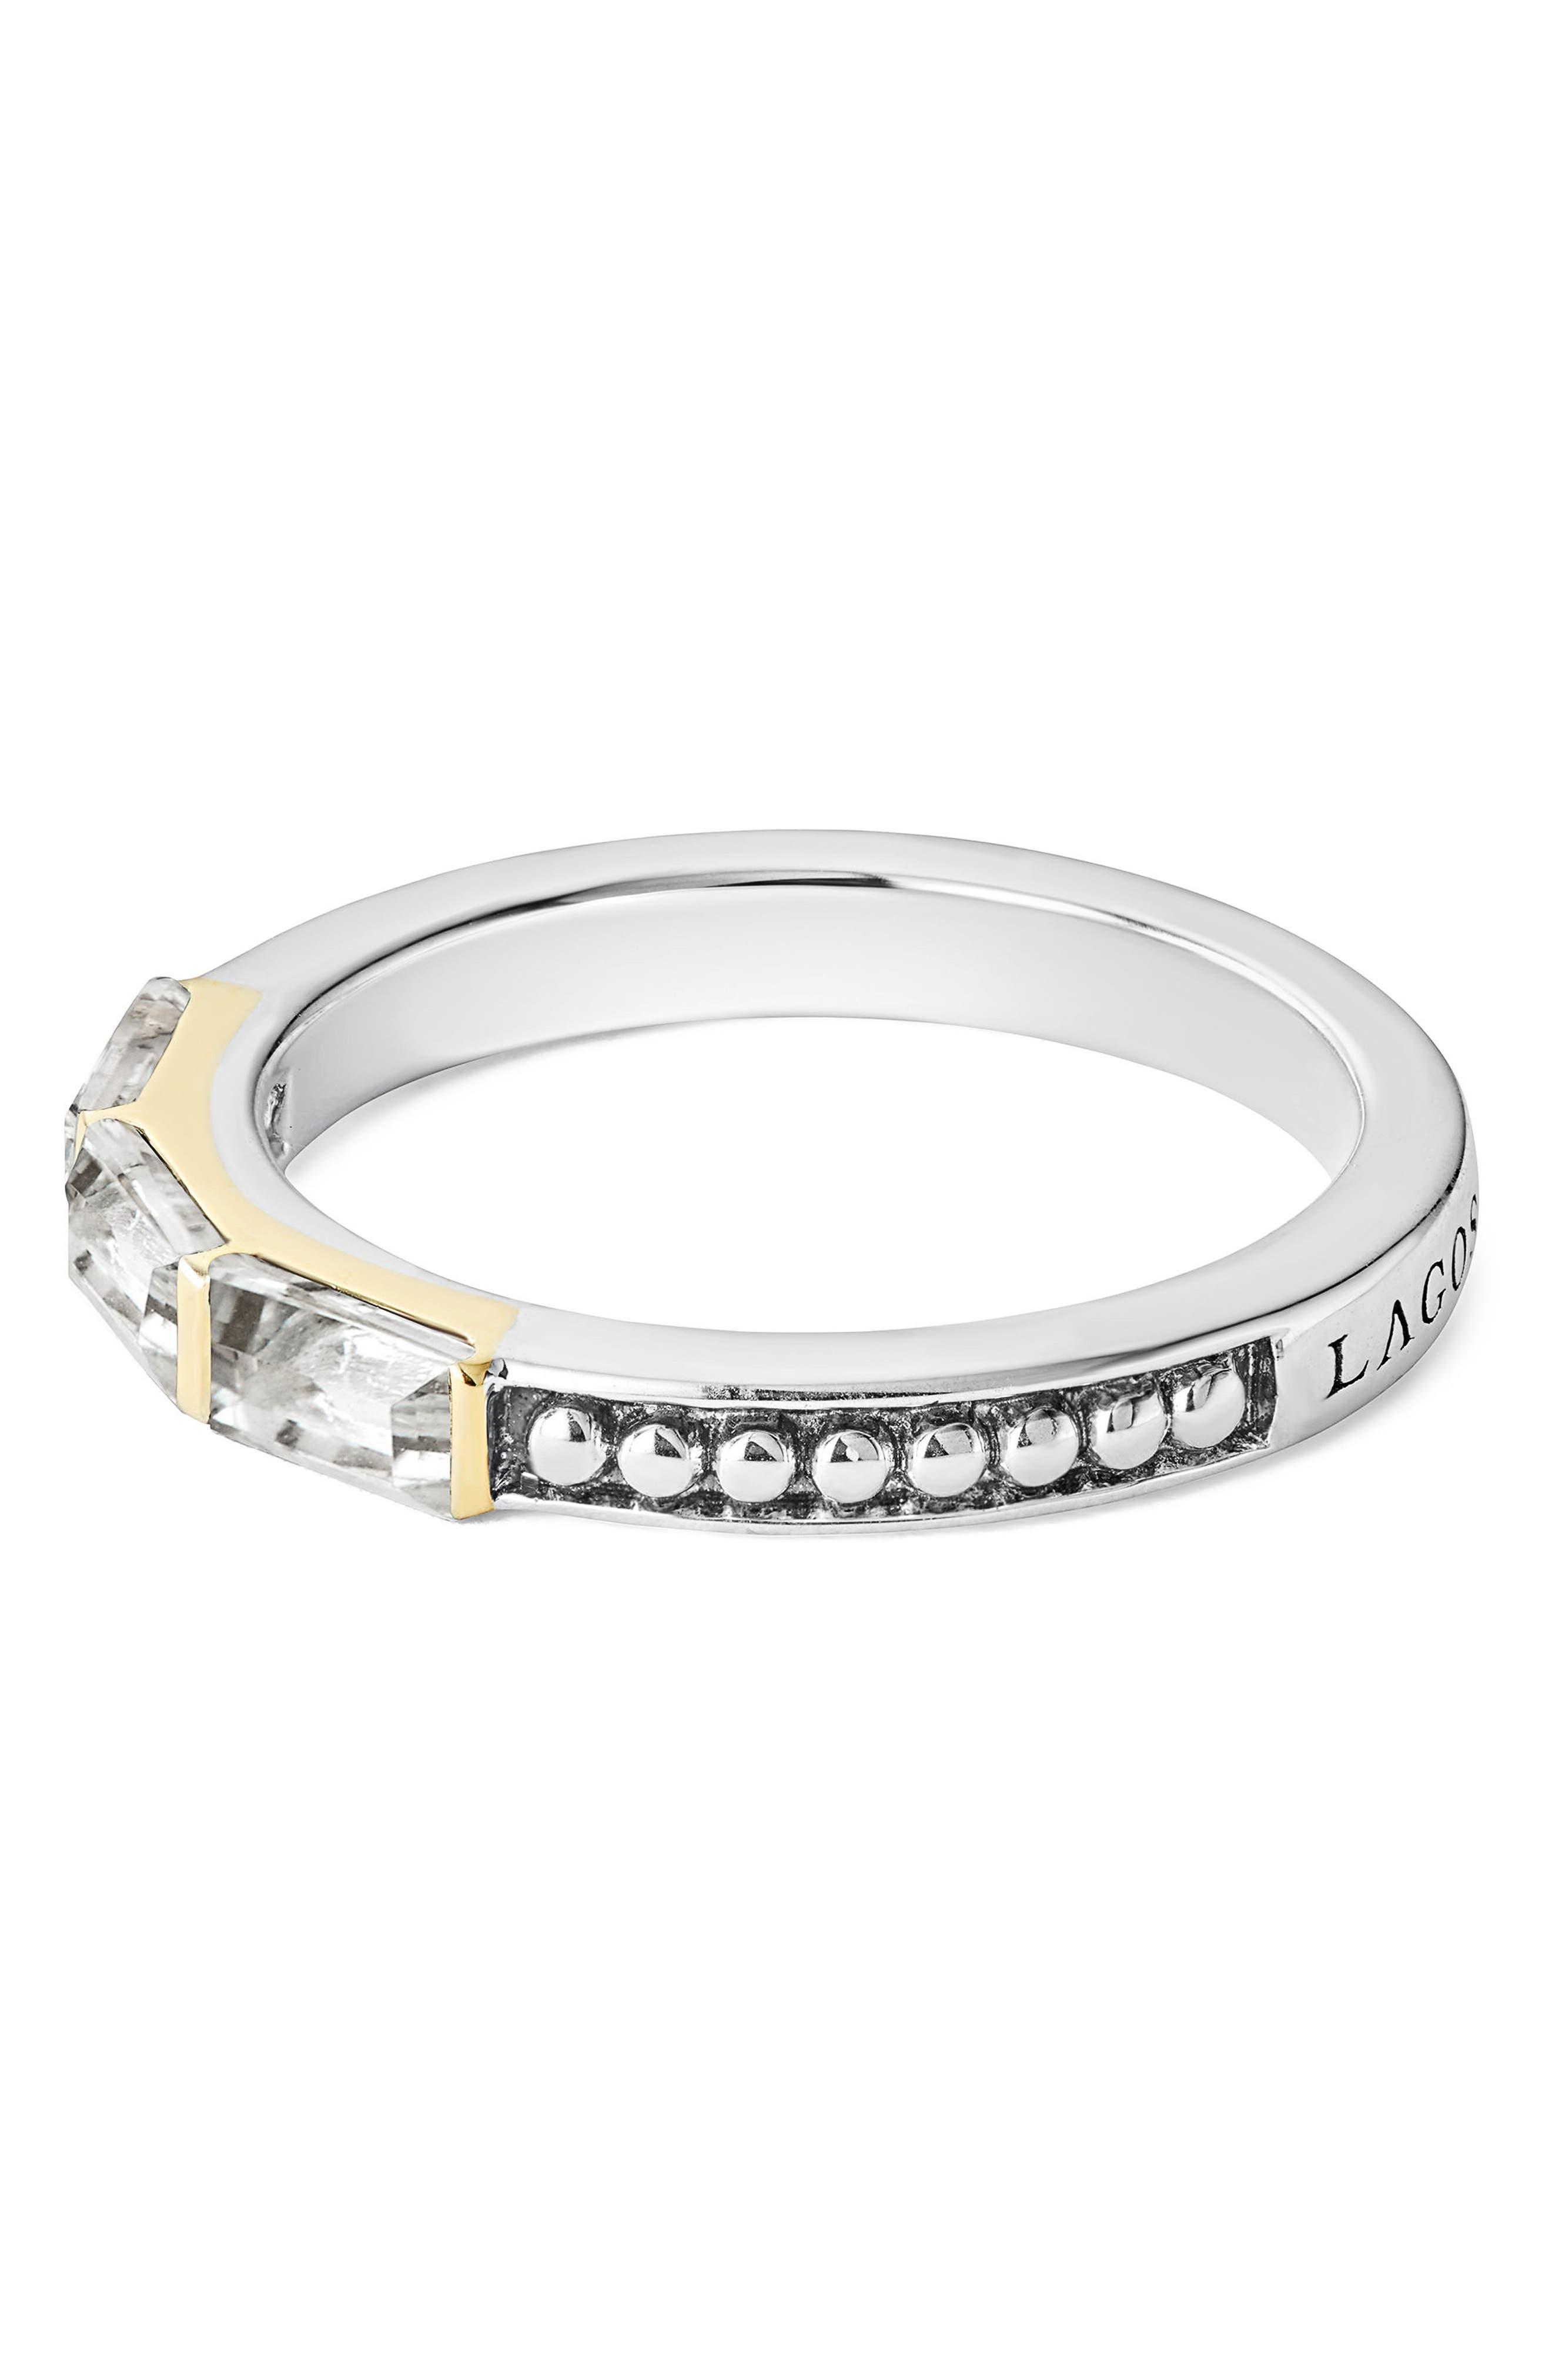 Gemstone Baguette Stackable Ring,                             Alternate thumbnail 2, color,                             SILVER/ 18K GOLD/ WHITE TOPAZ